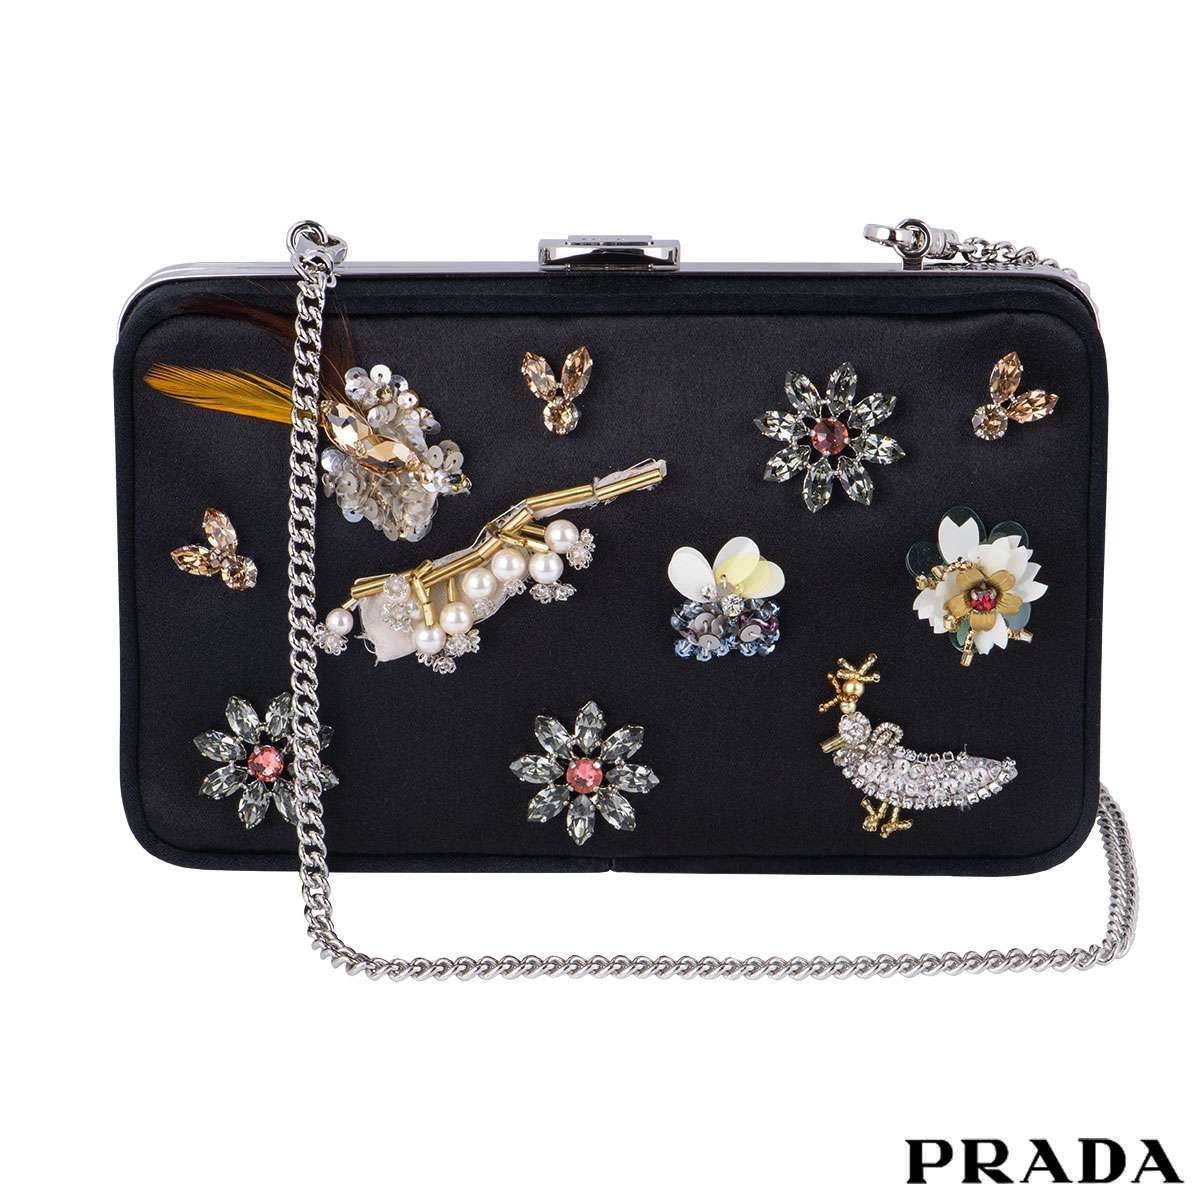 Prada Satin Embellished Box Clutch